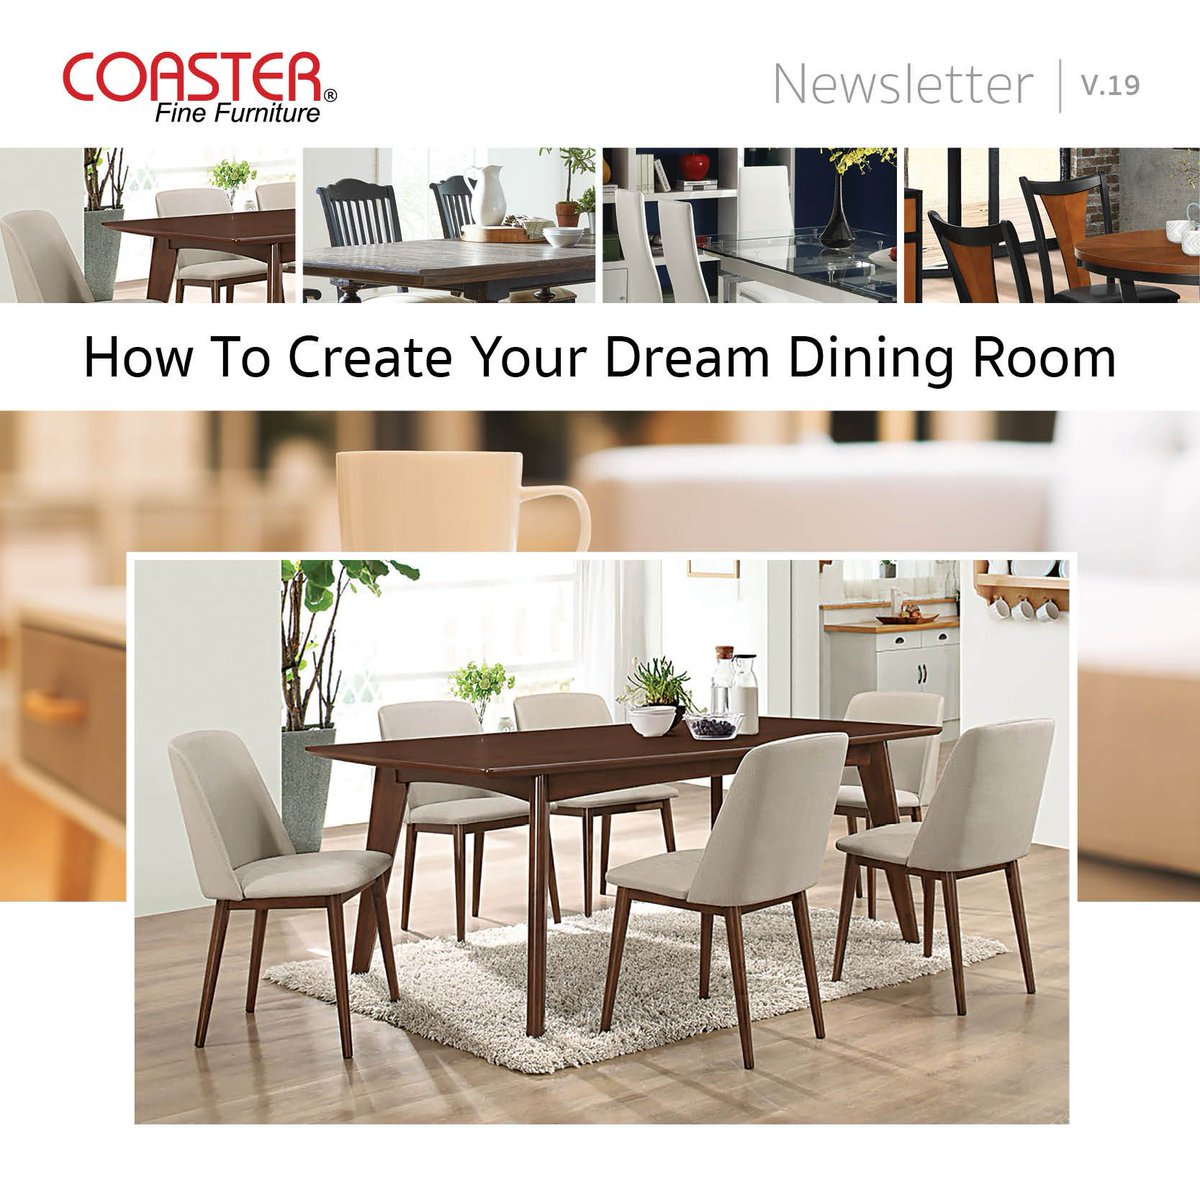 Coaster Fine Furniture Dining Table